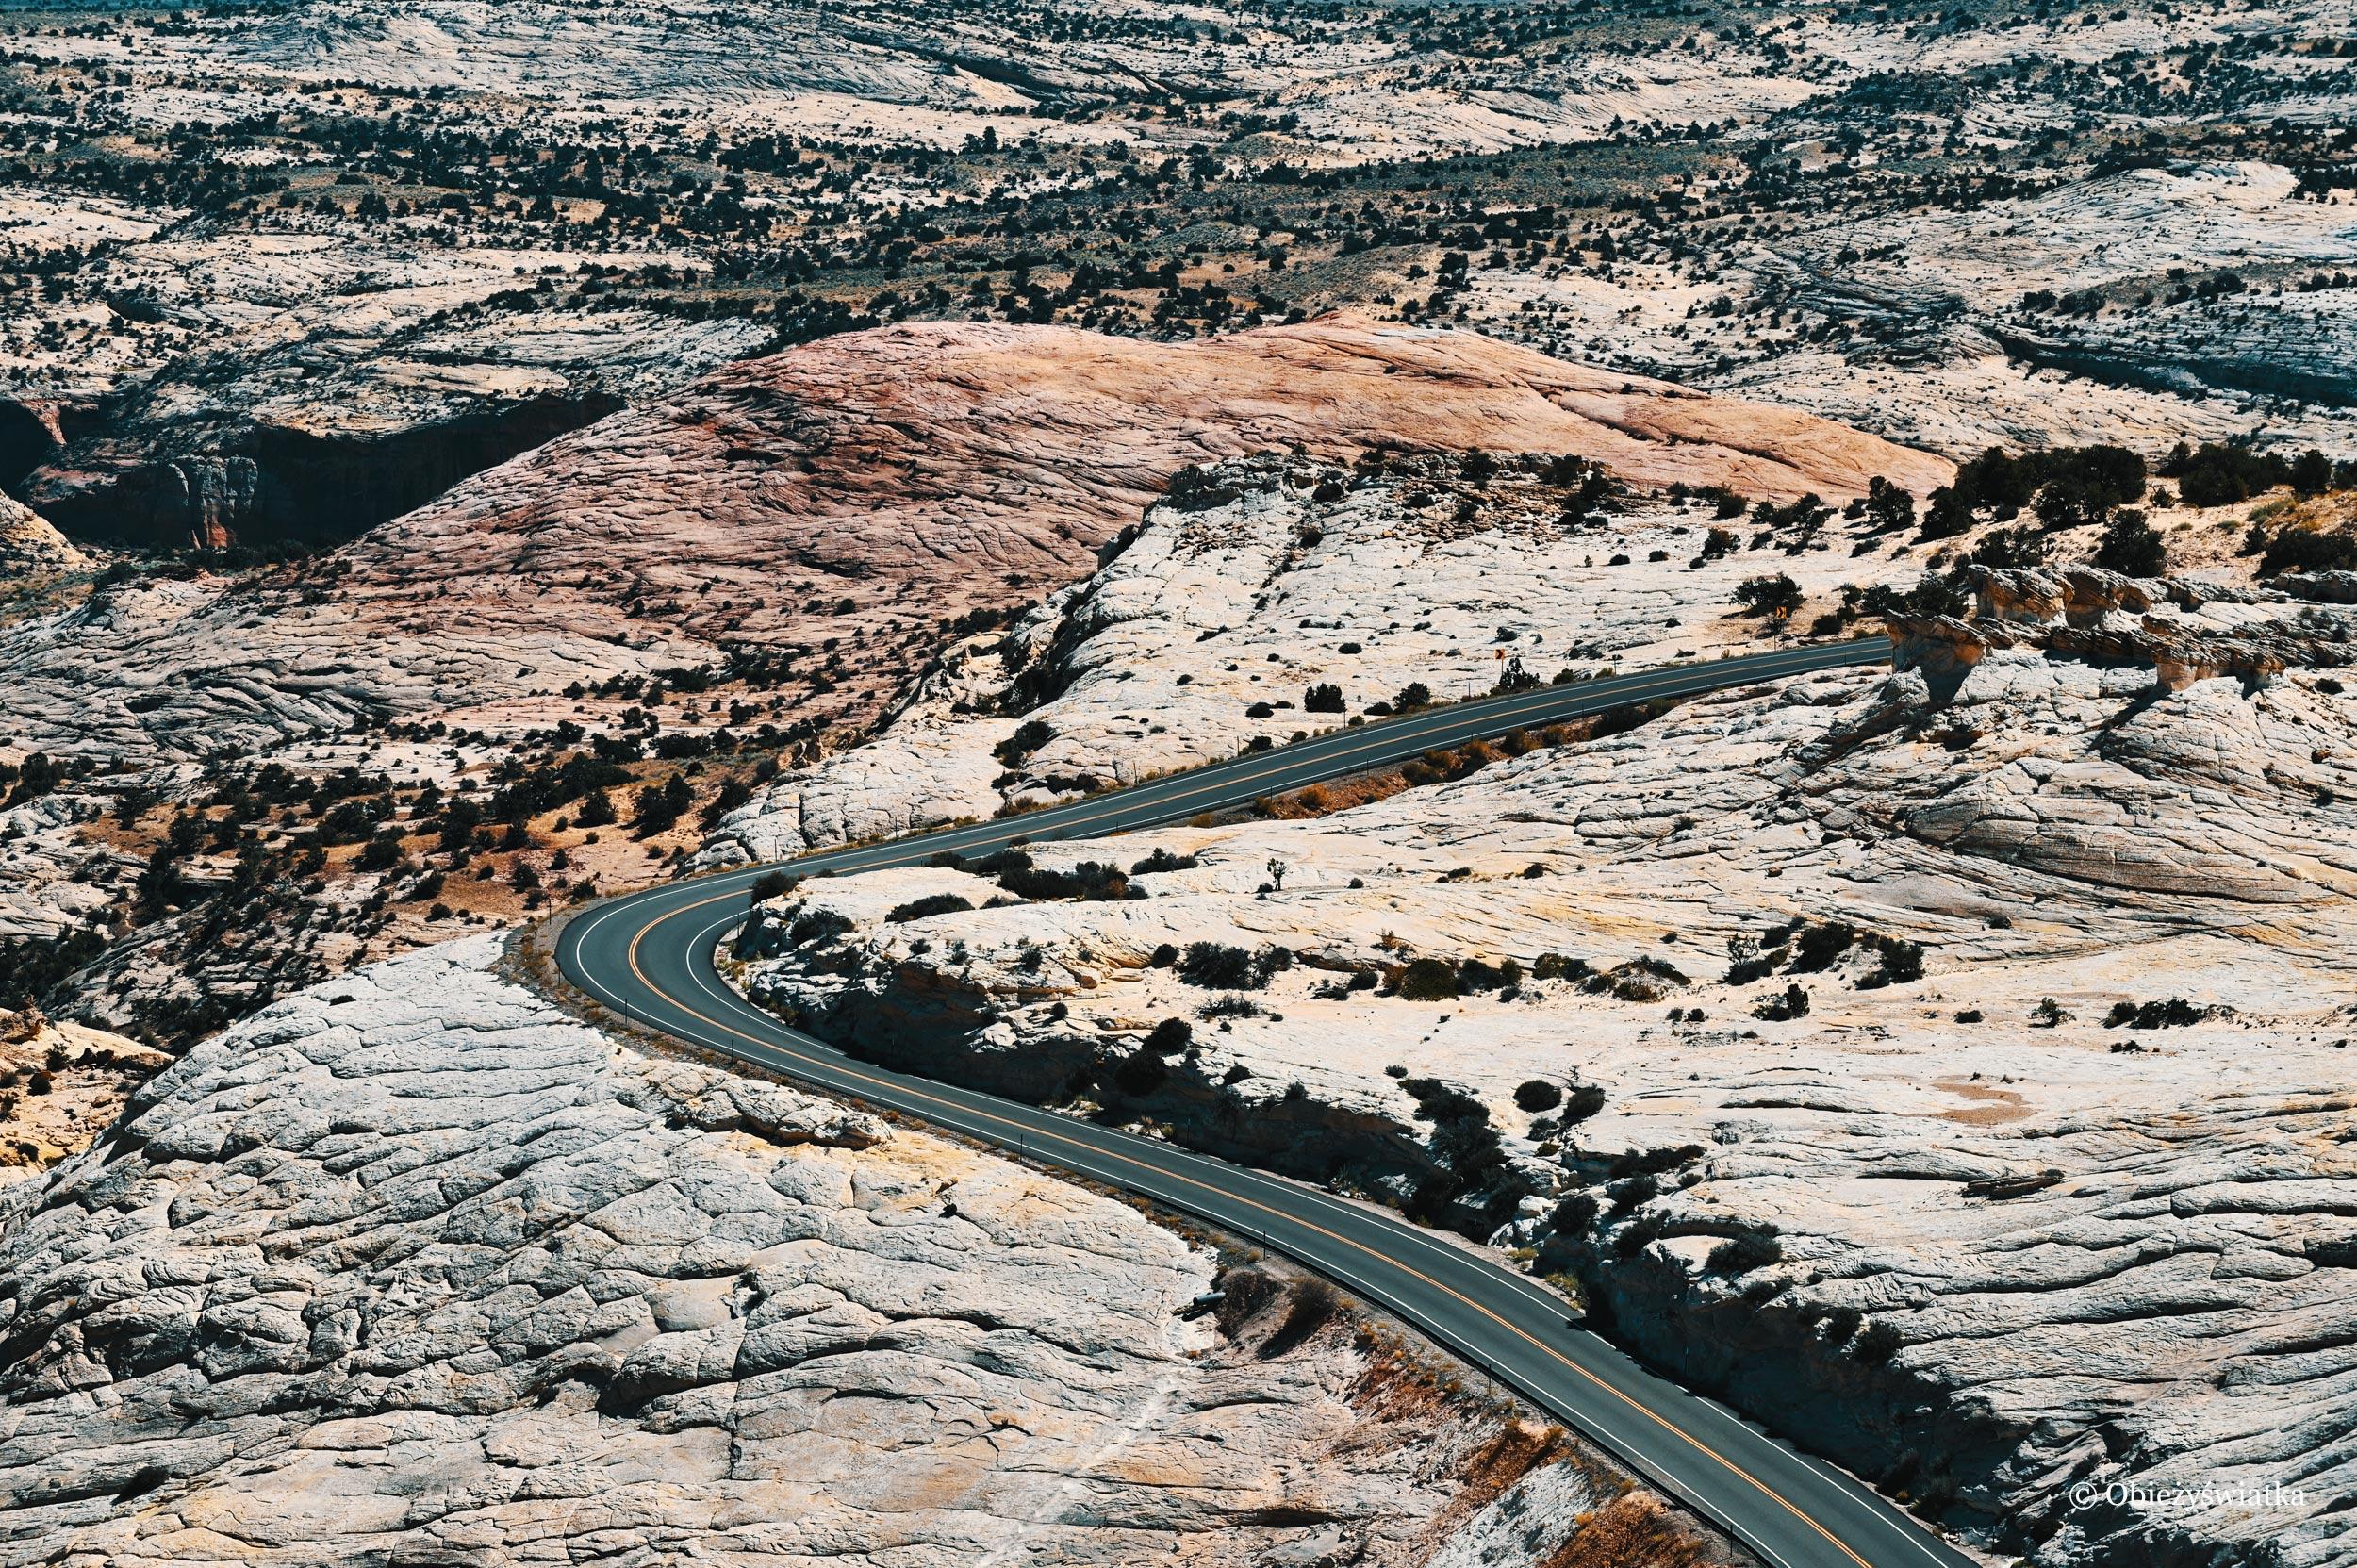 Wstęga drogi - Highway 12, Utah